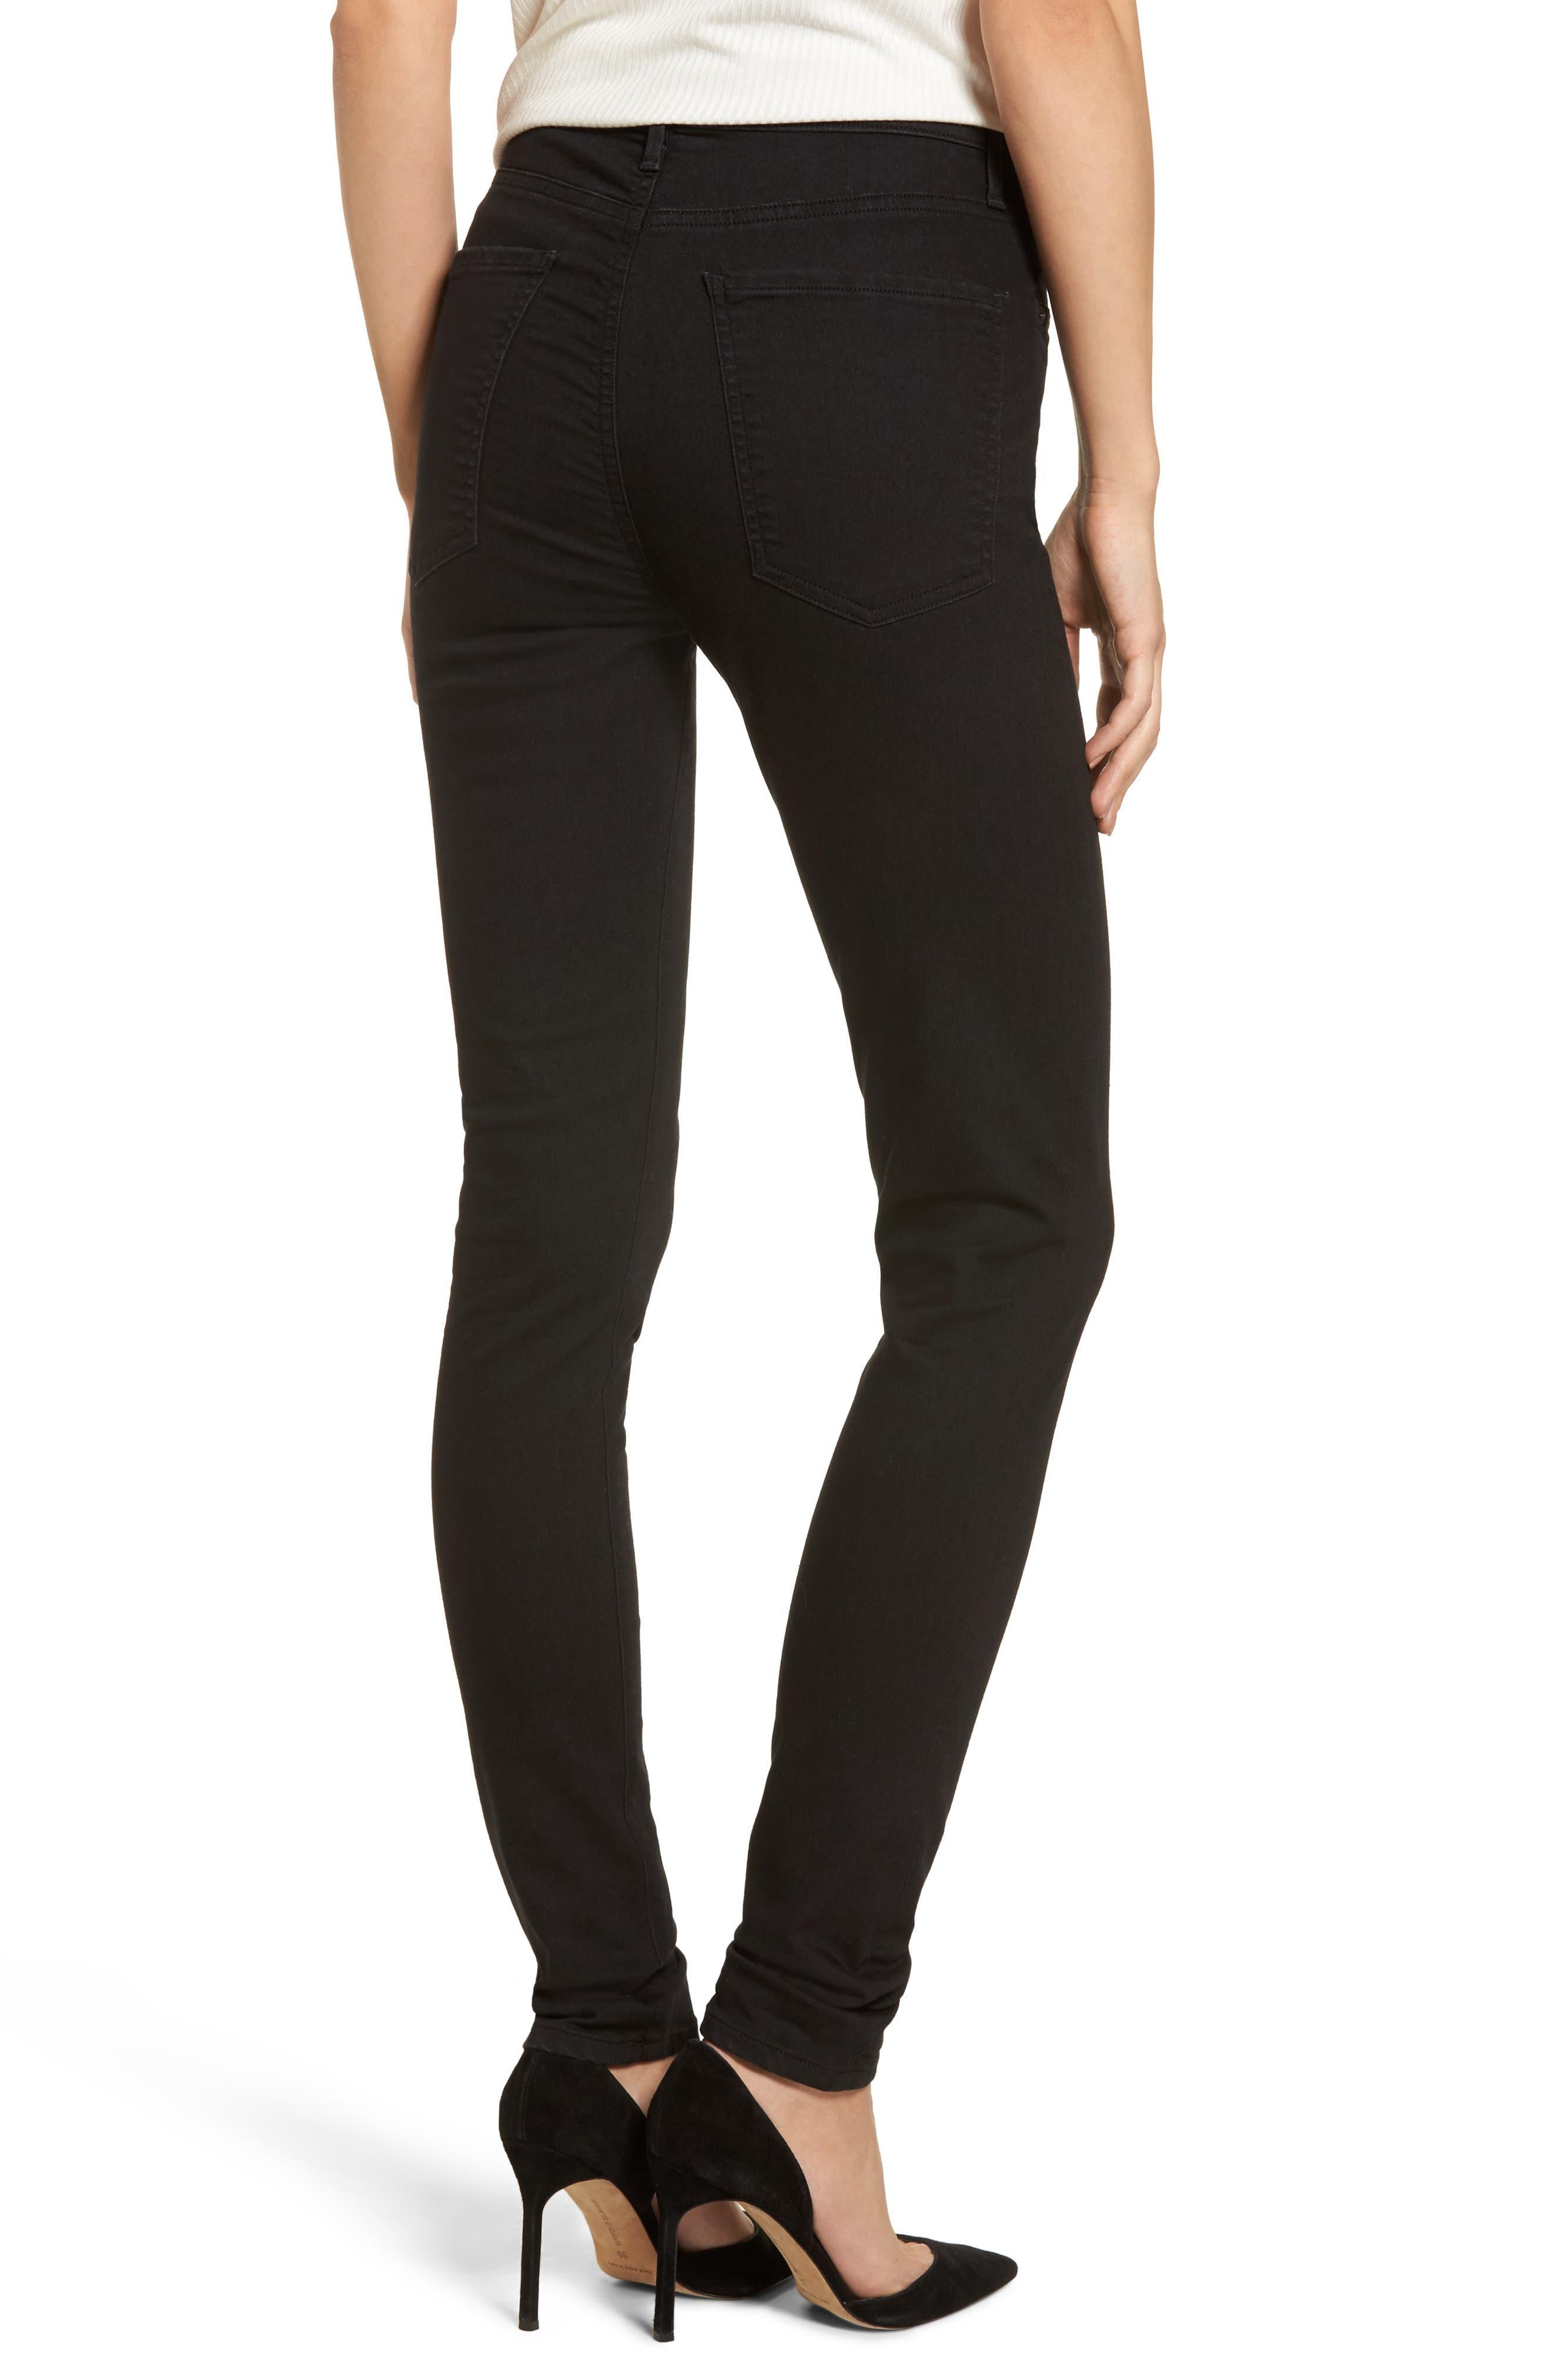 Carlie High Waist Skinny Jeans,                             Alternate thumbnail 2, color,                             011